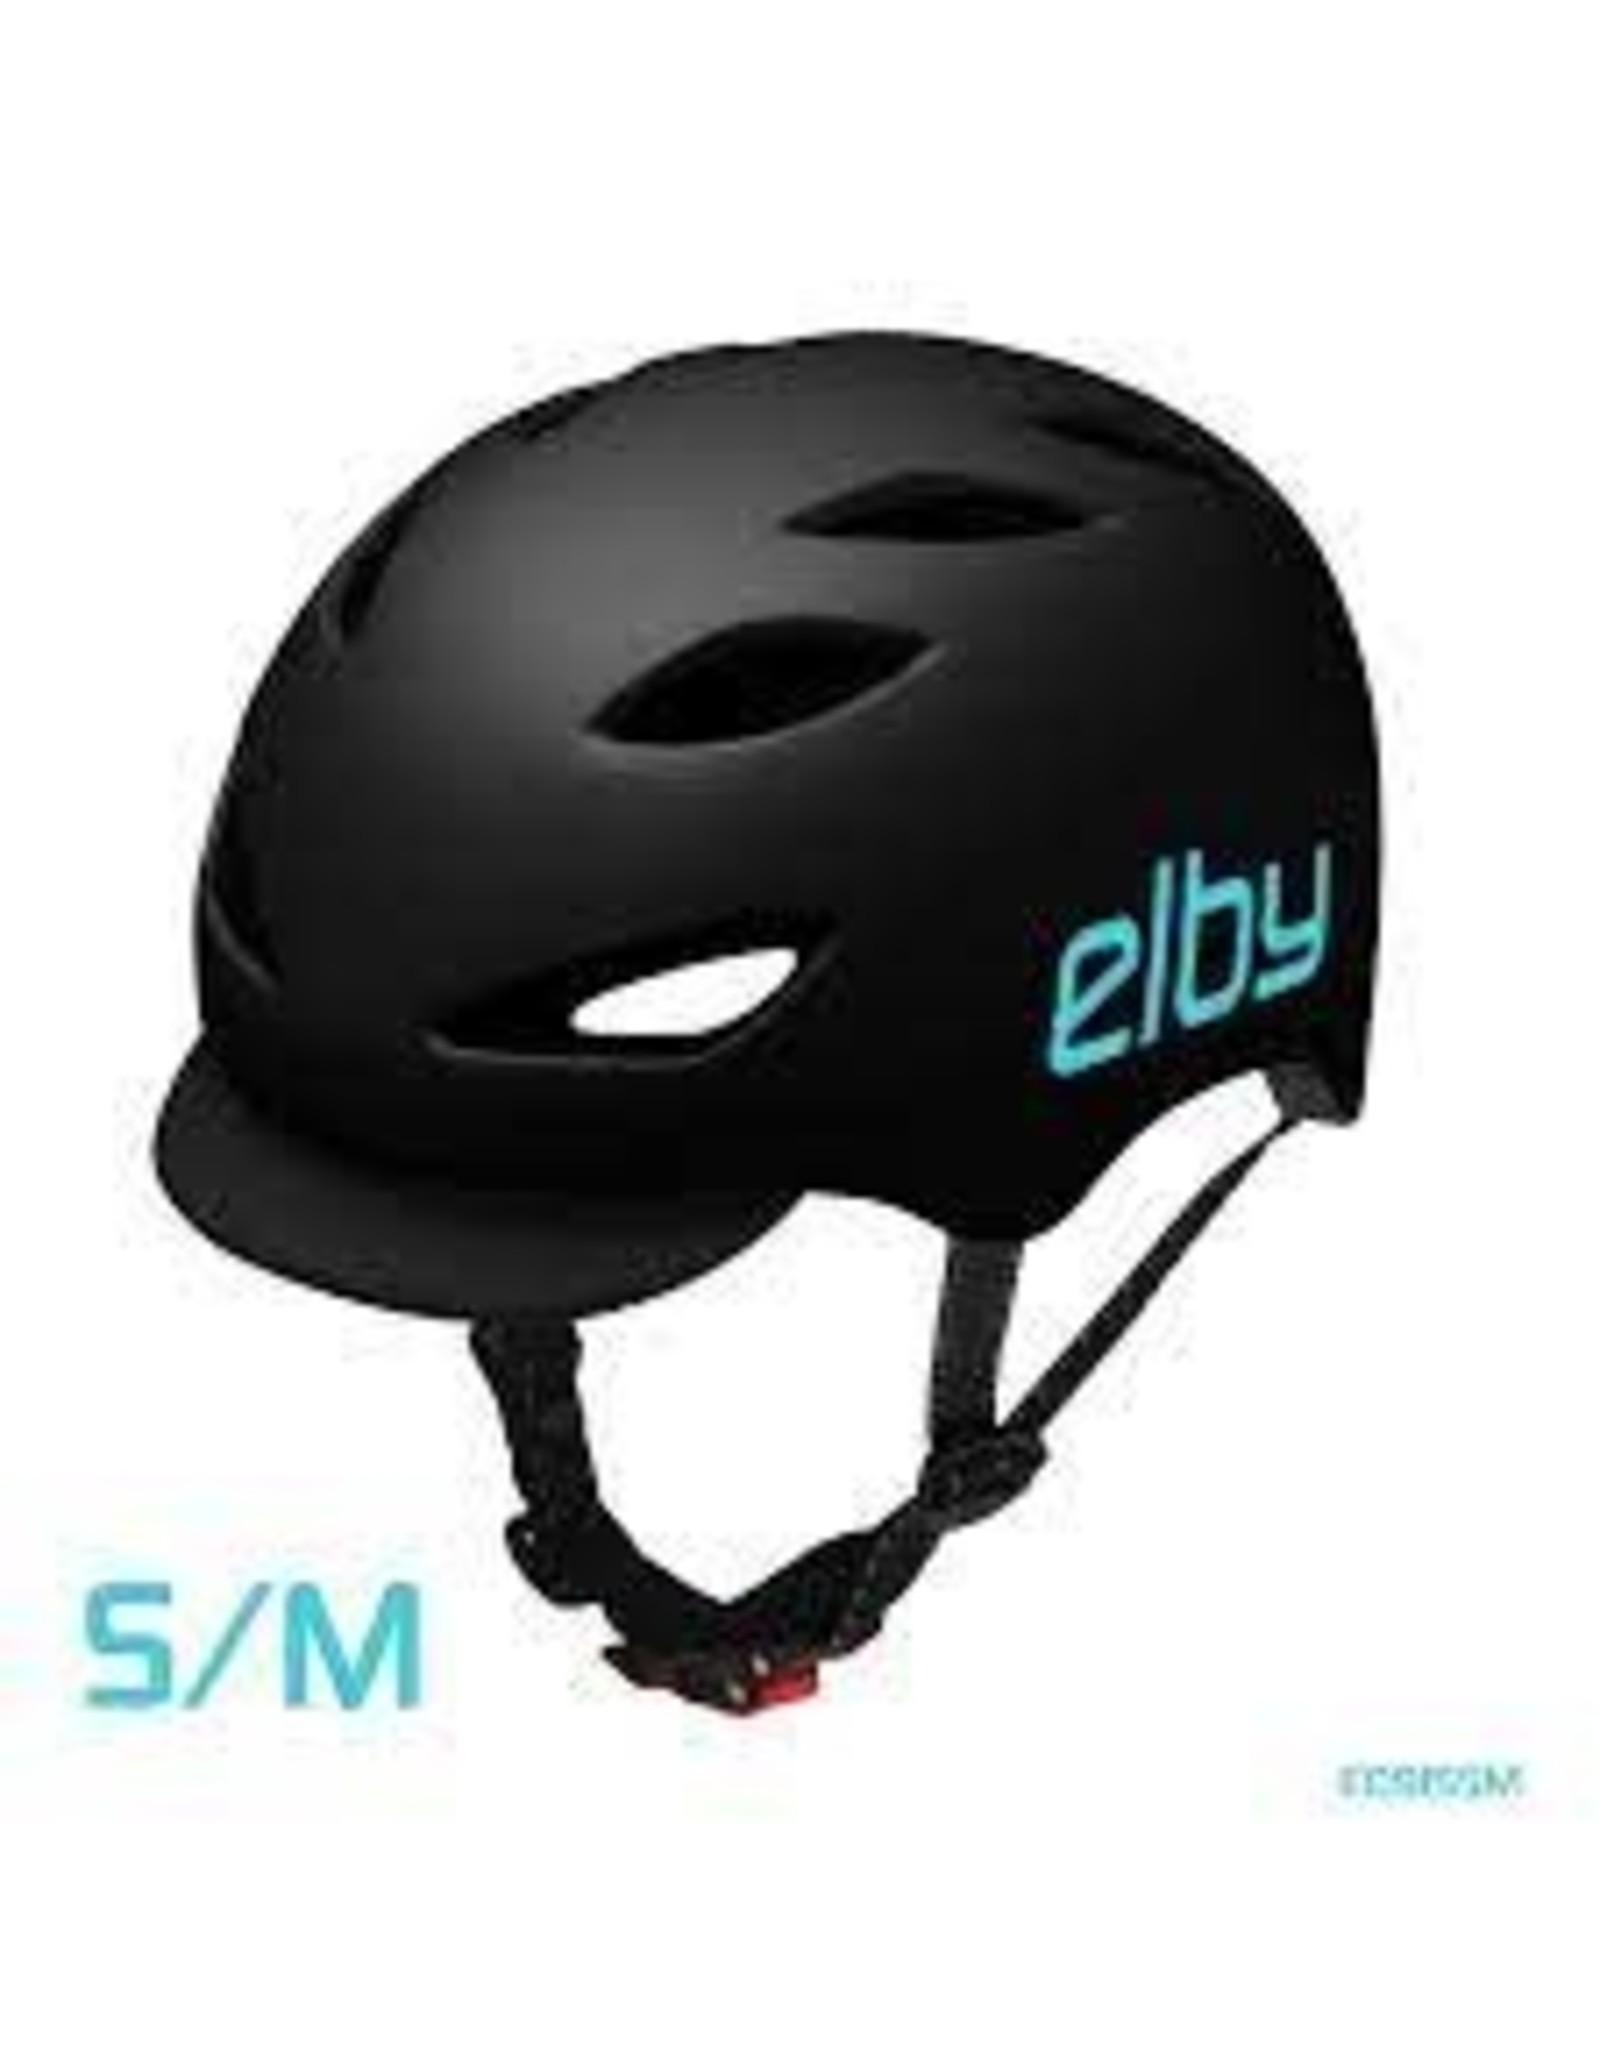 Elby Elby - Urban Commuter Helmet Black M/L